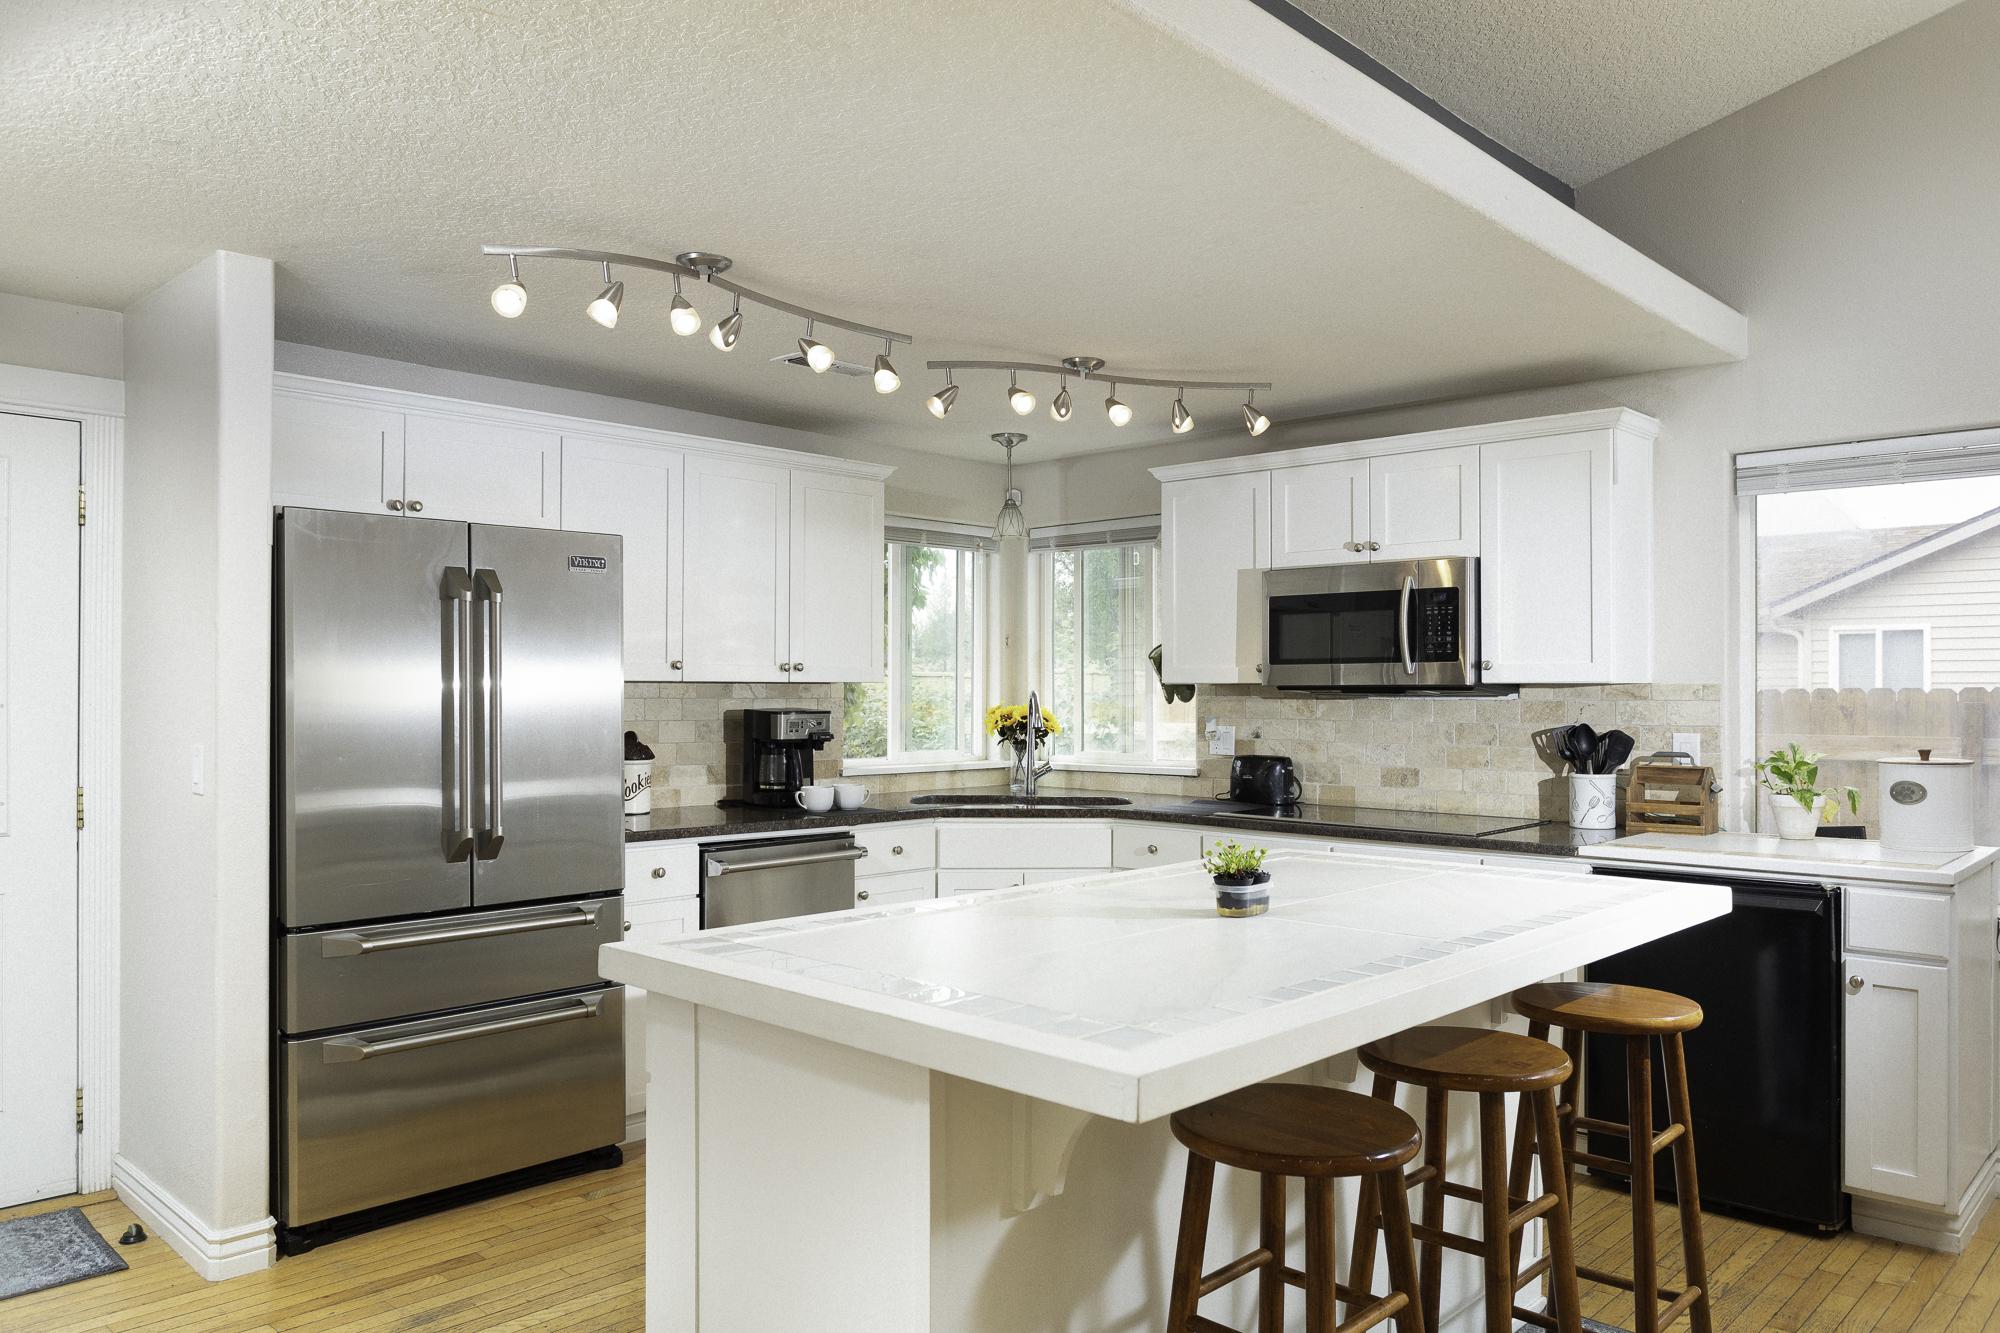 Bend Homes for sale under $325,000.00